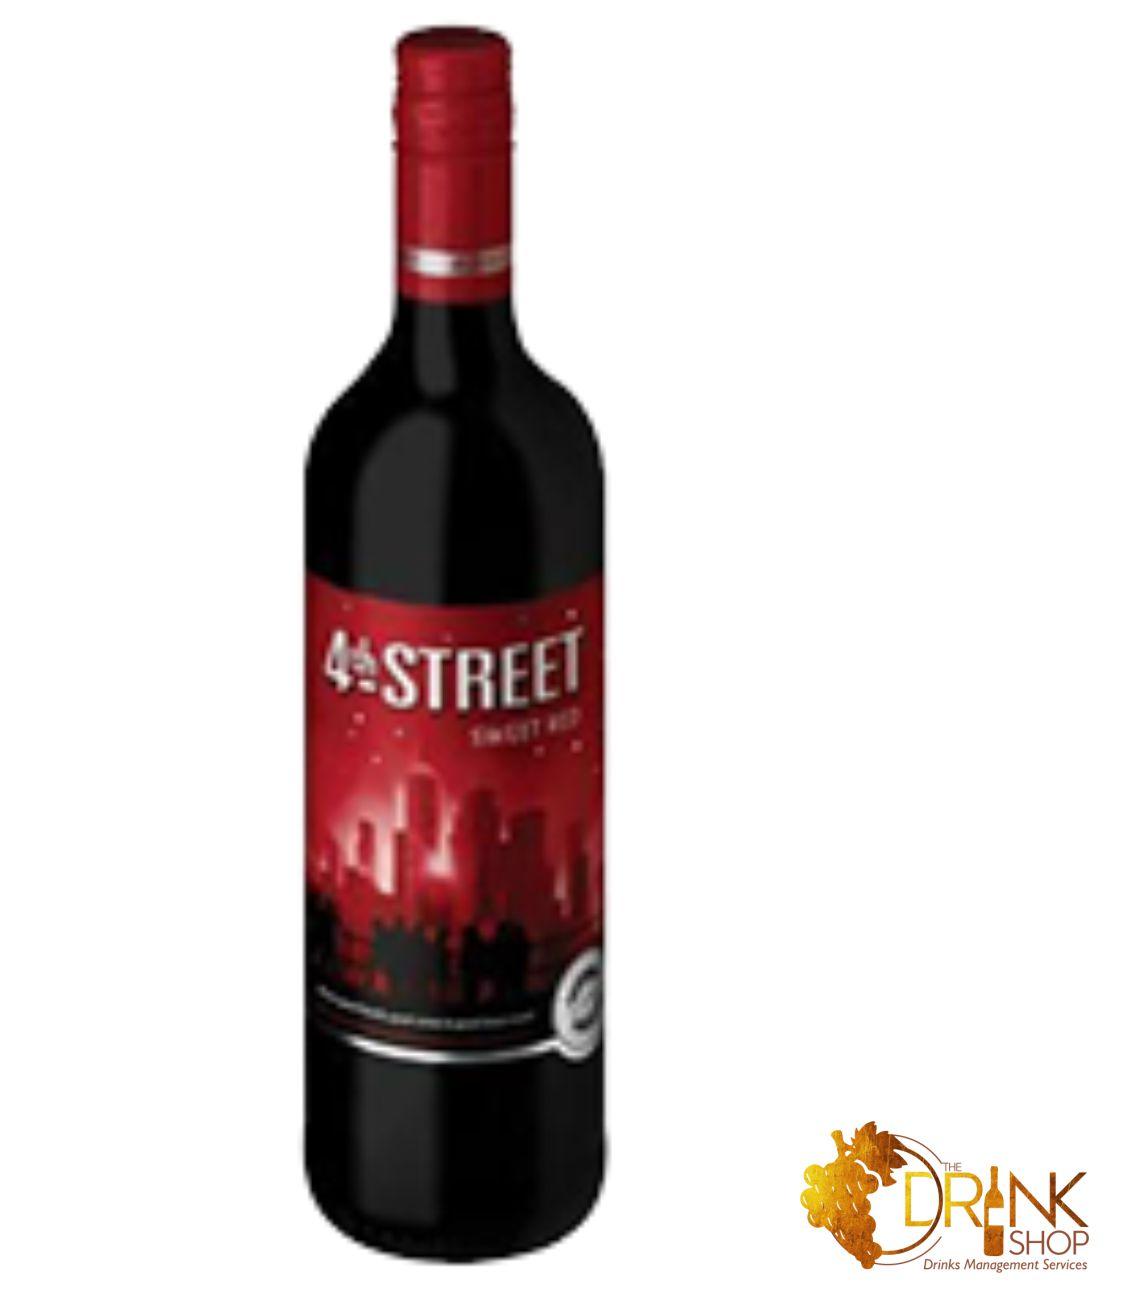 4th Street Sweet Red Wine 75cl The Drink Shop Nigeria Buy Drinks Online